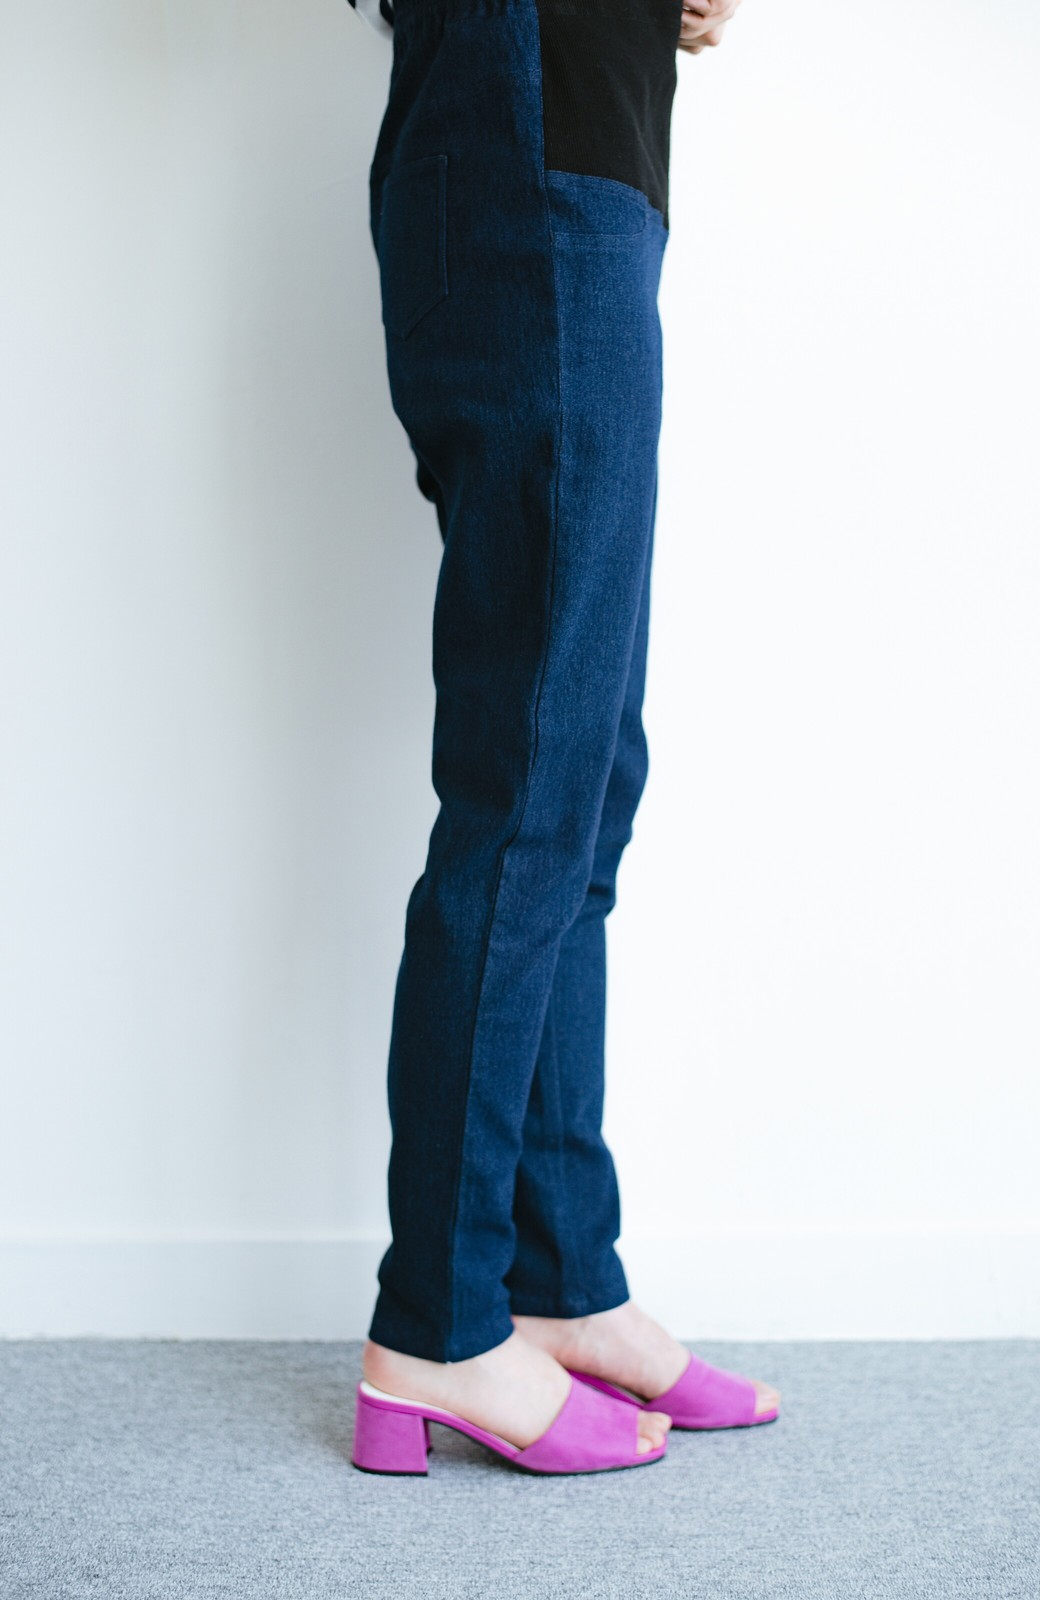 haco! おなかあったか安心感スキニーパンツ【ブルー期】女の子バンザイ!プロジェクト <ダークインディゴブルー>の商品写真6